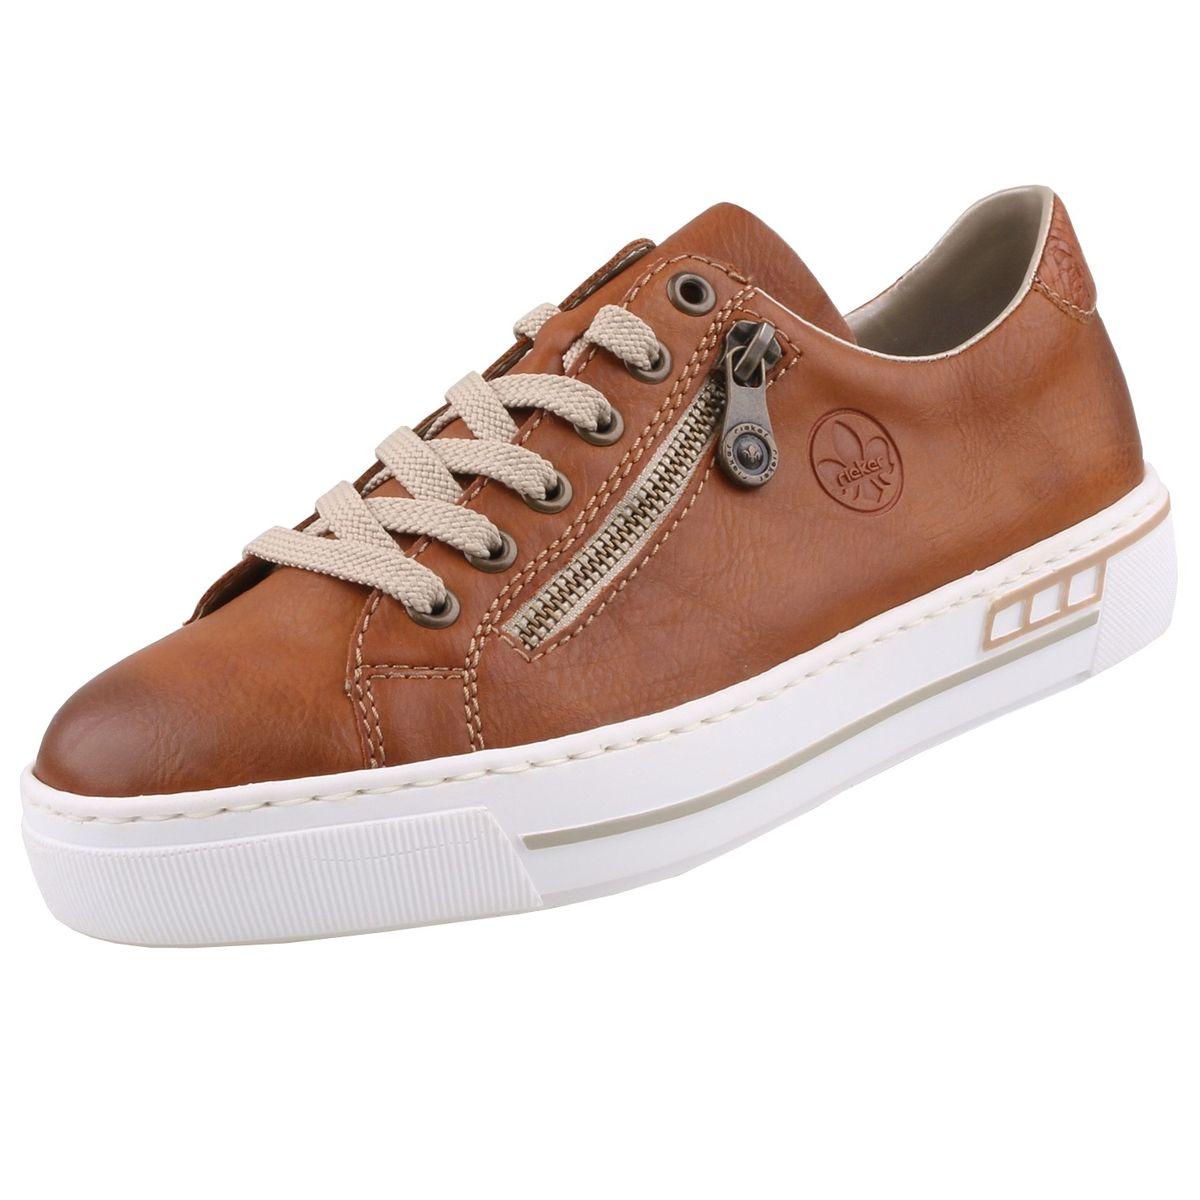 Rieker Damen Sneaker Braun | Trendbereich